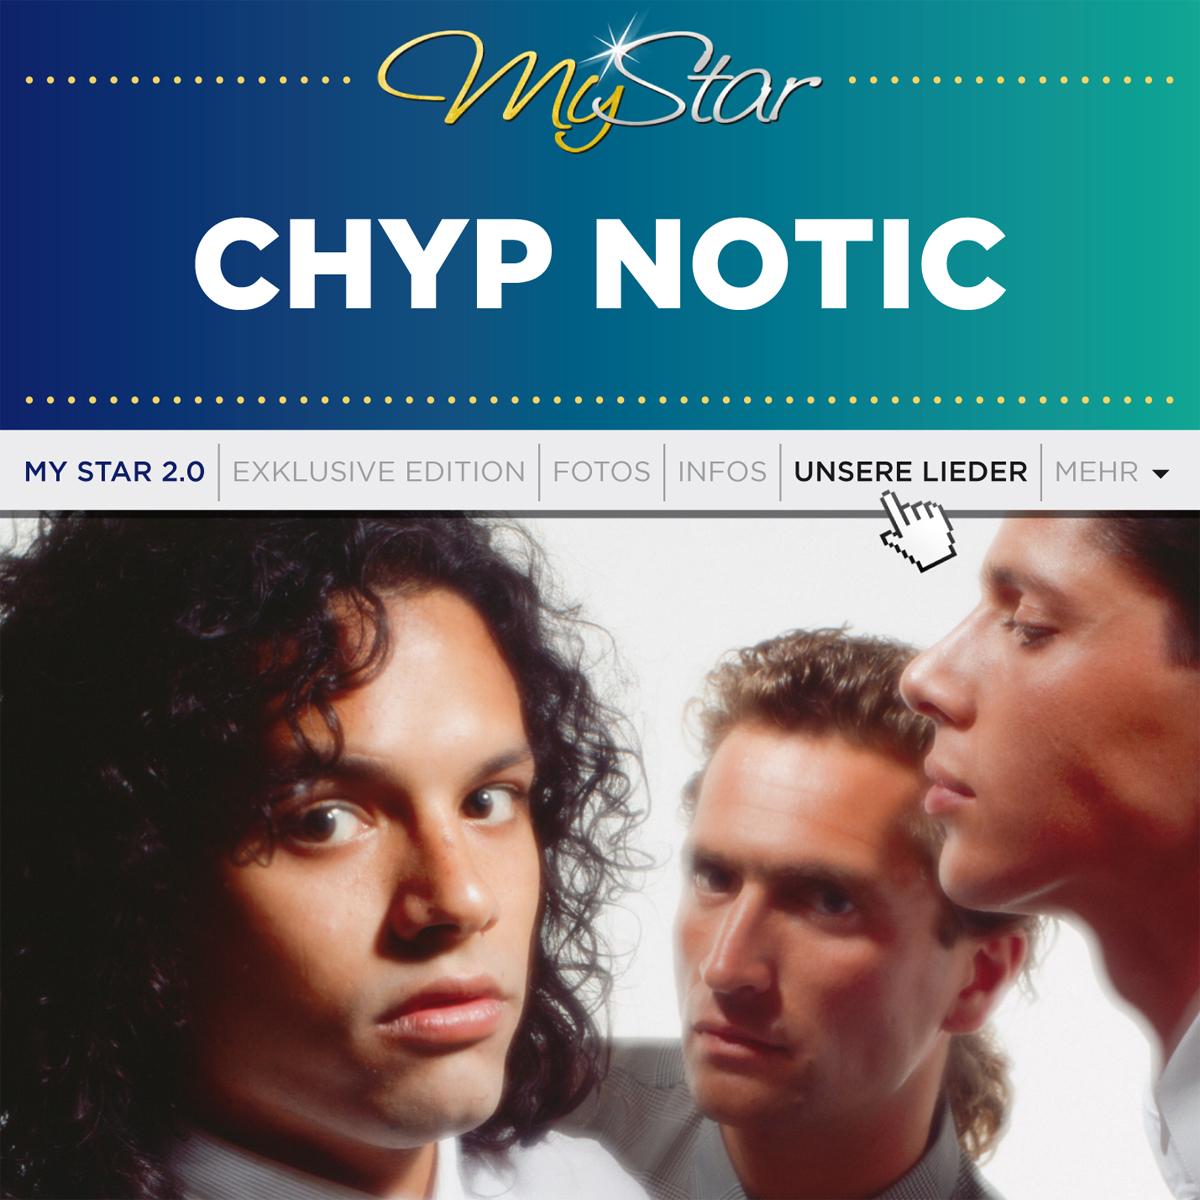 CHYP-NOTIC - MY STAR